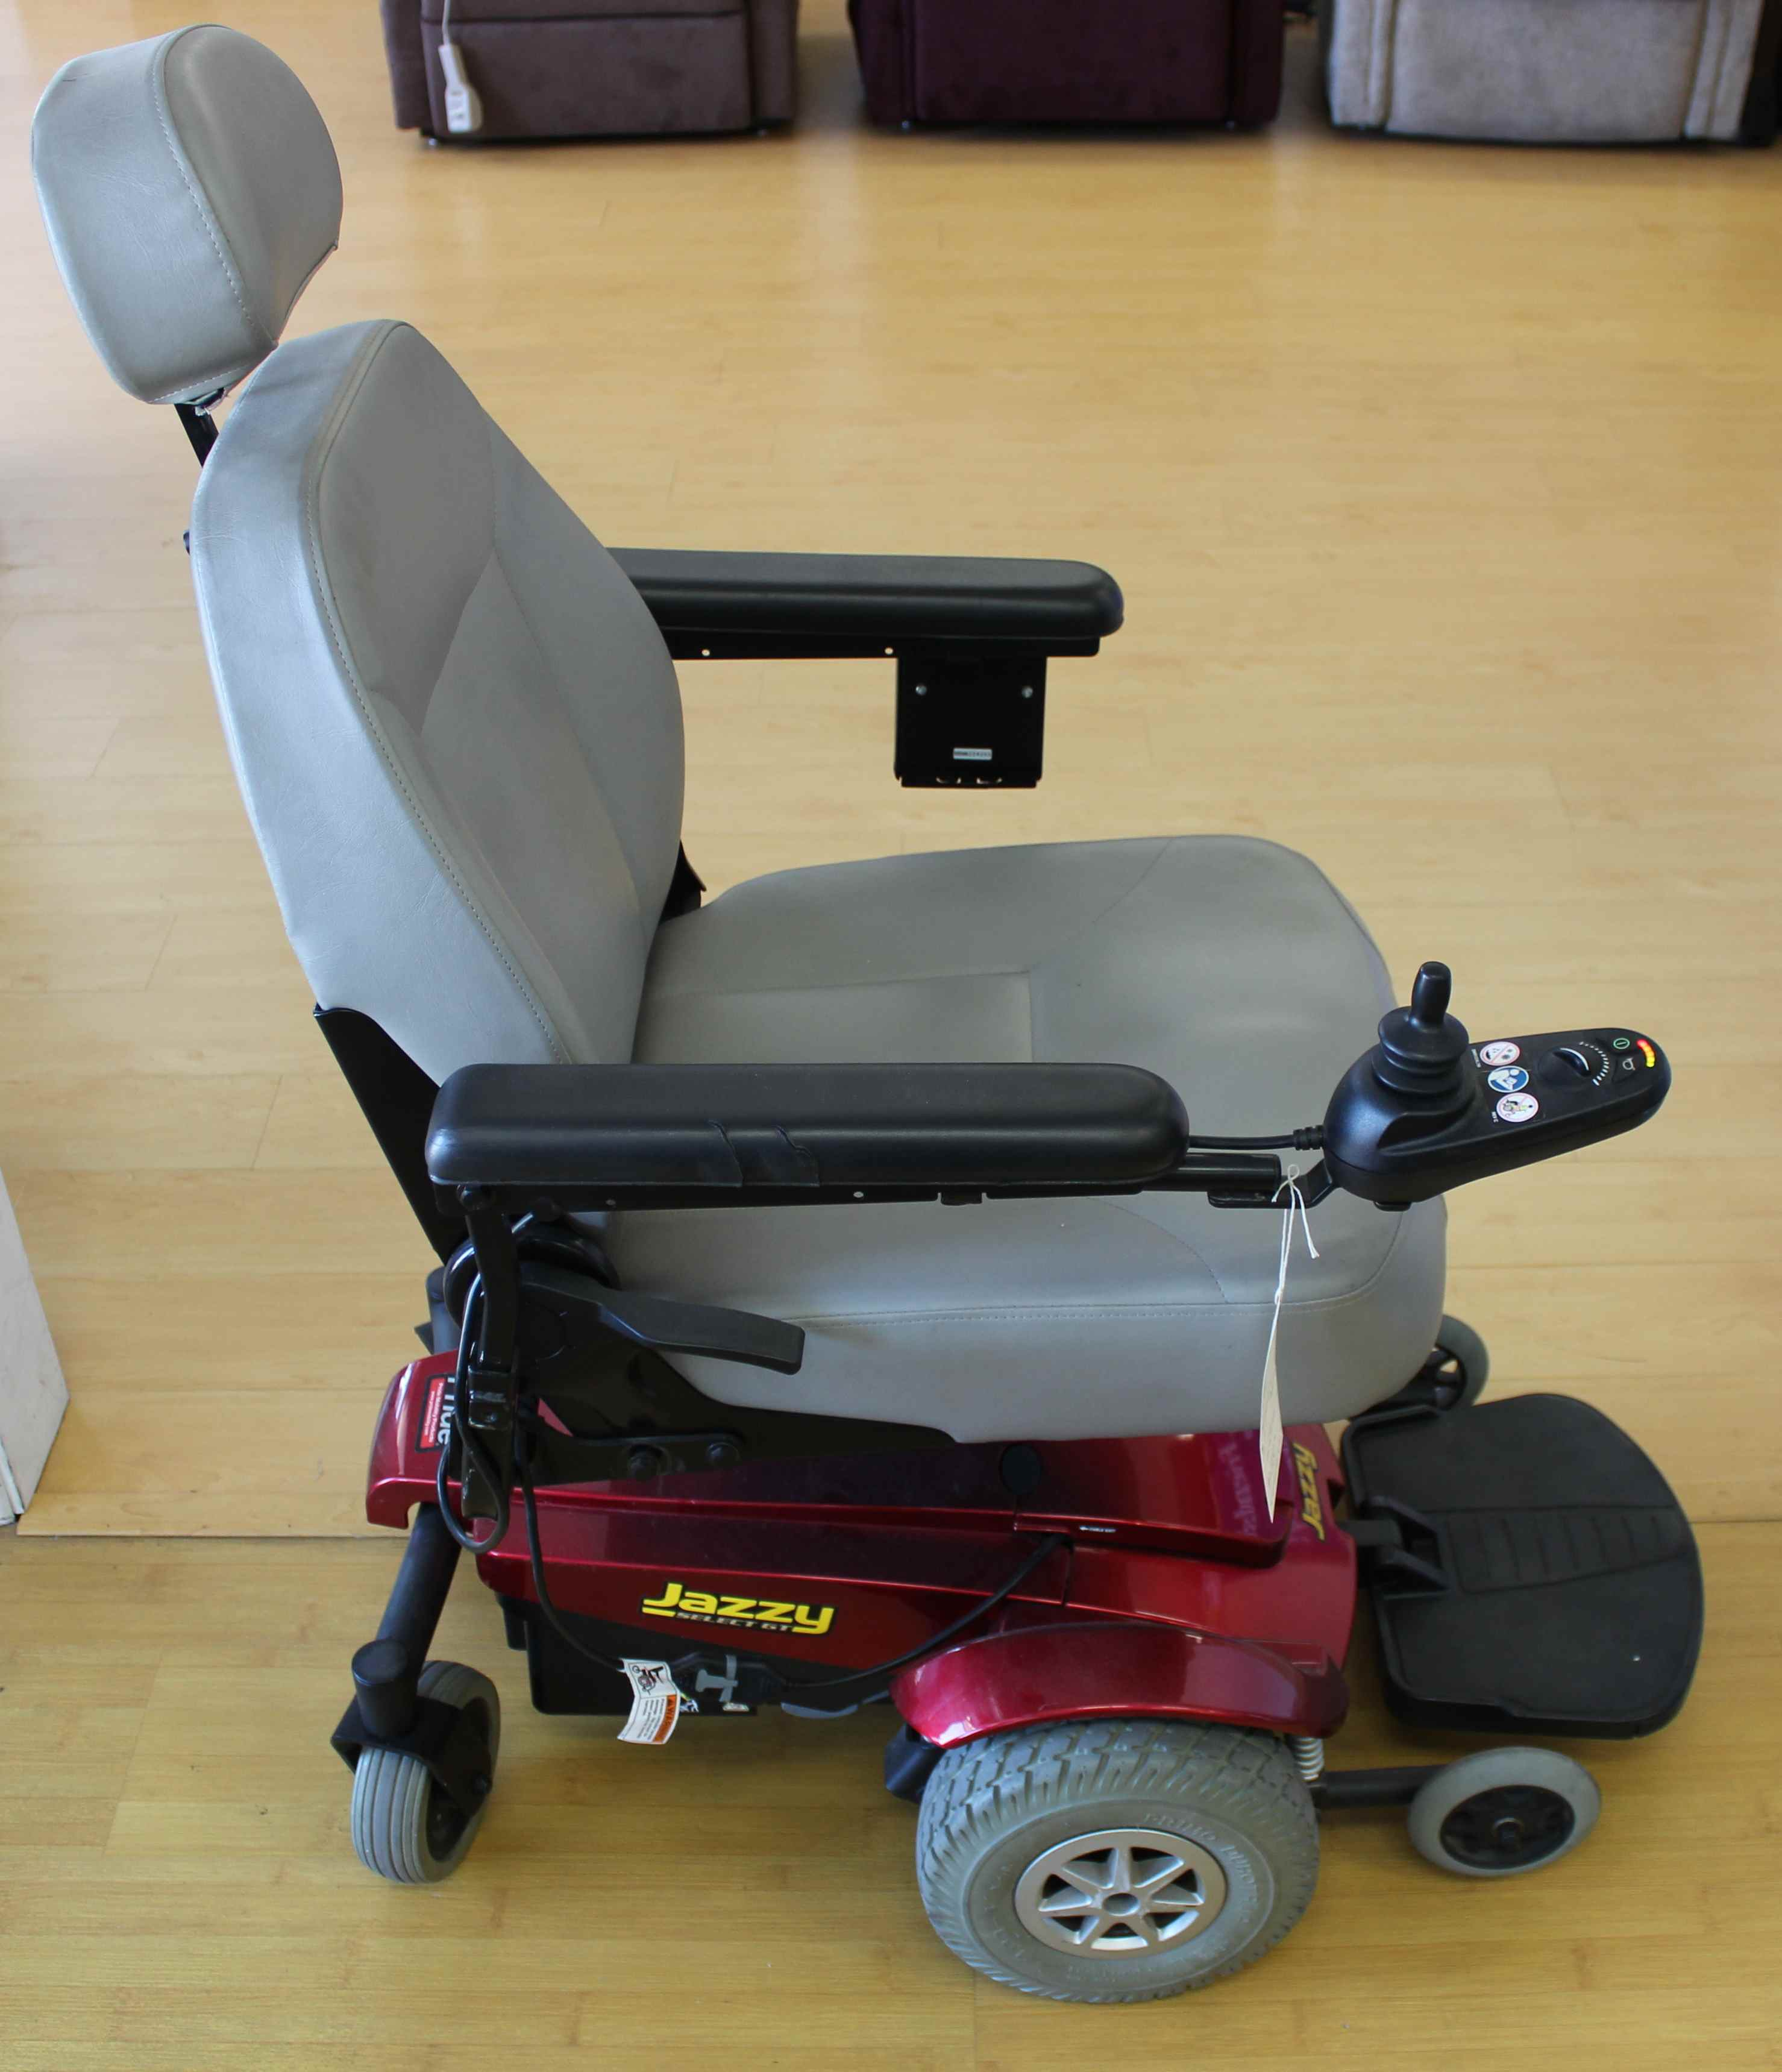 pride-jazzy-power-wheelchair-rental-delivery-los-angeles-south-bay-long-beach-palos-verdes-san-pedro-torrance-redondo-beach-manhattan-beach-carson1.jpeg